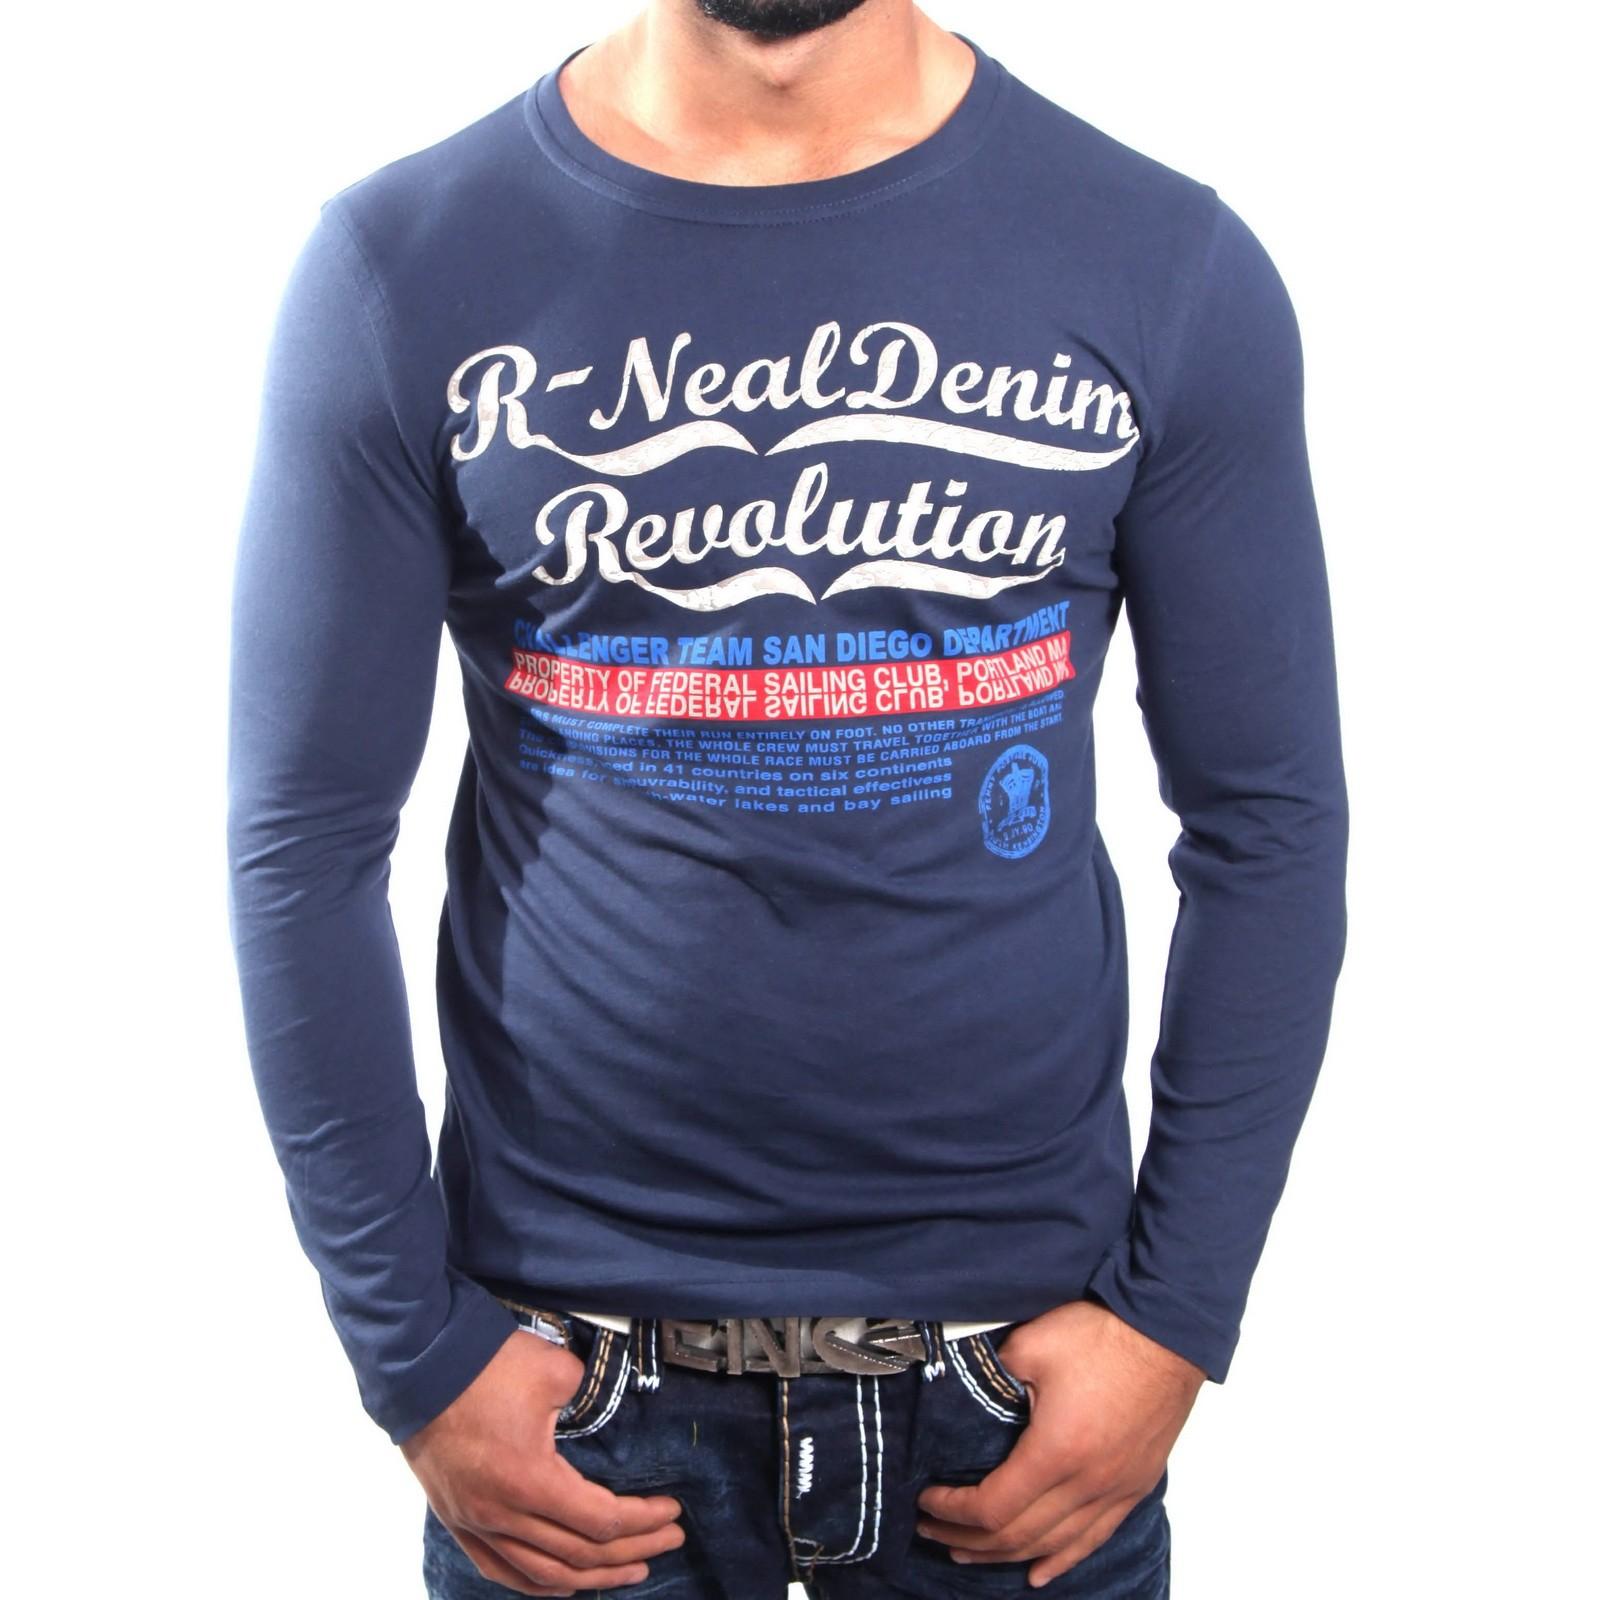 Longshirt Blau 5305 R-Neal